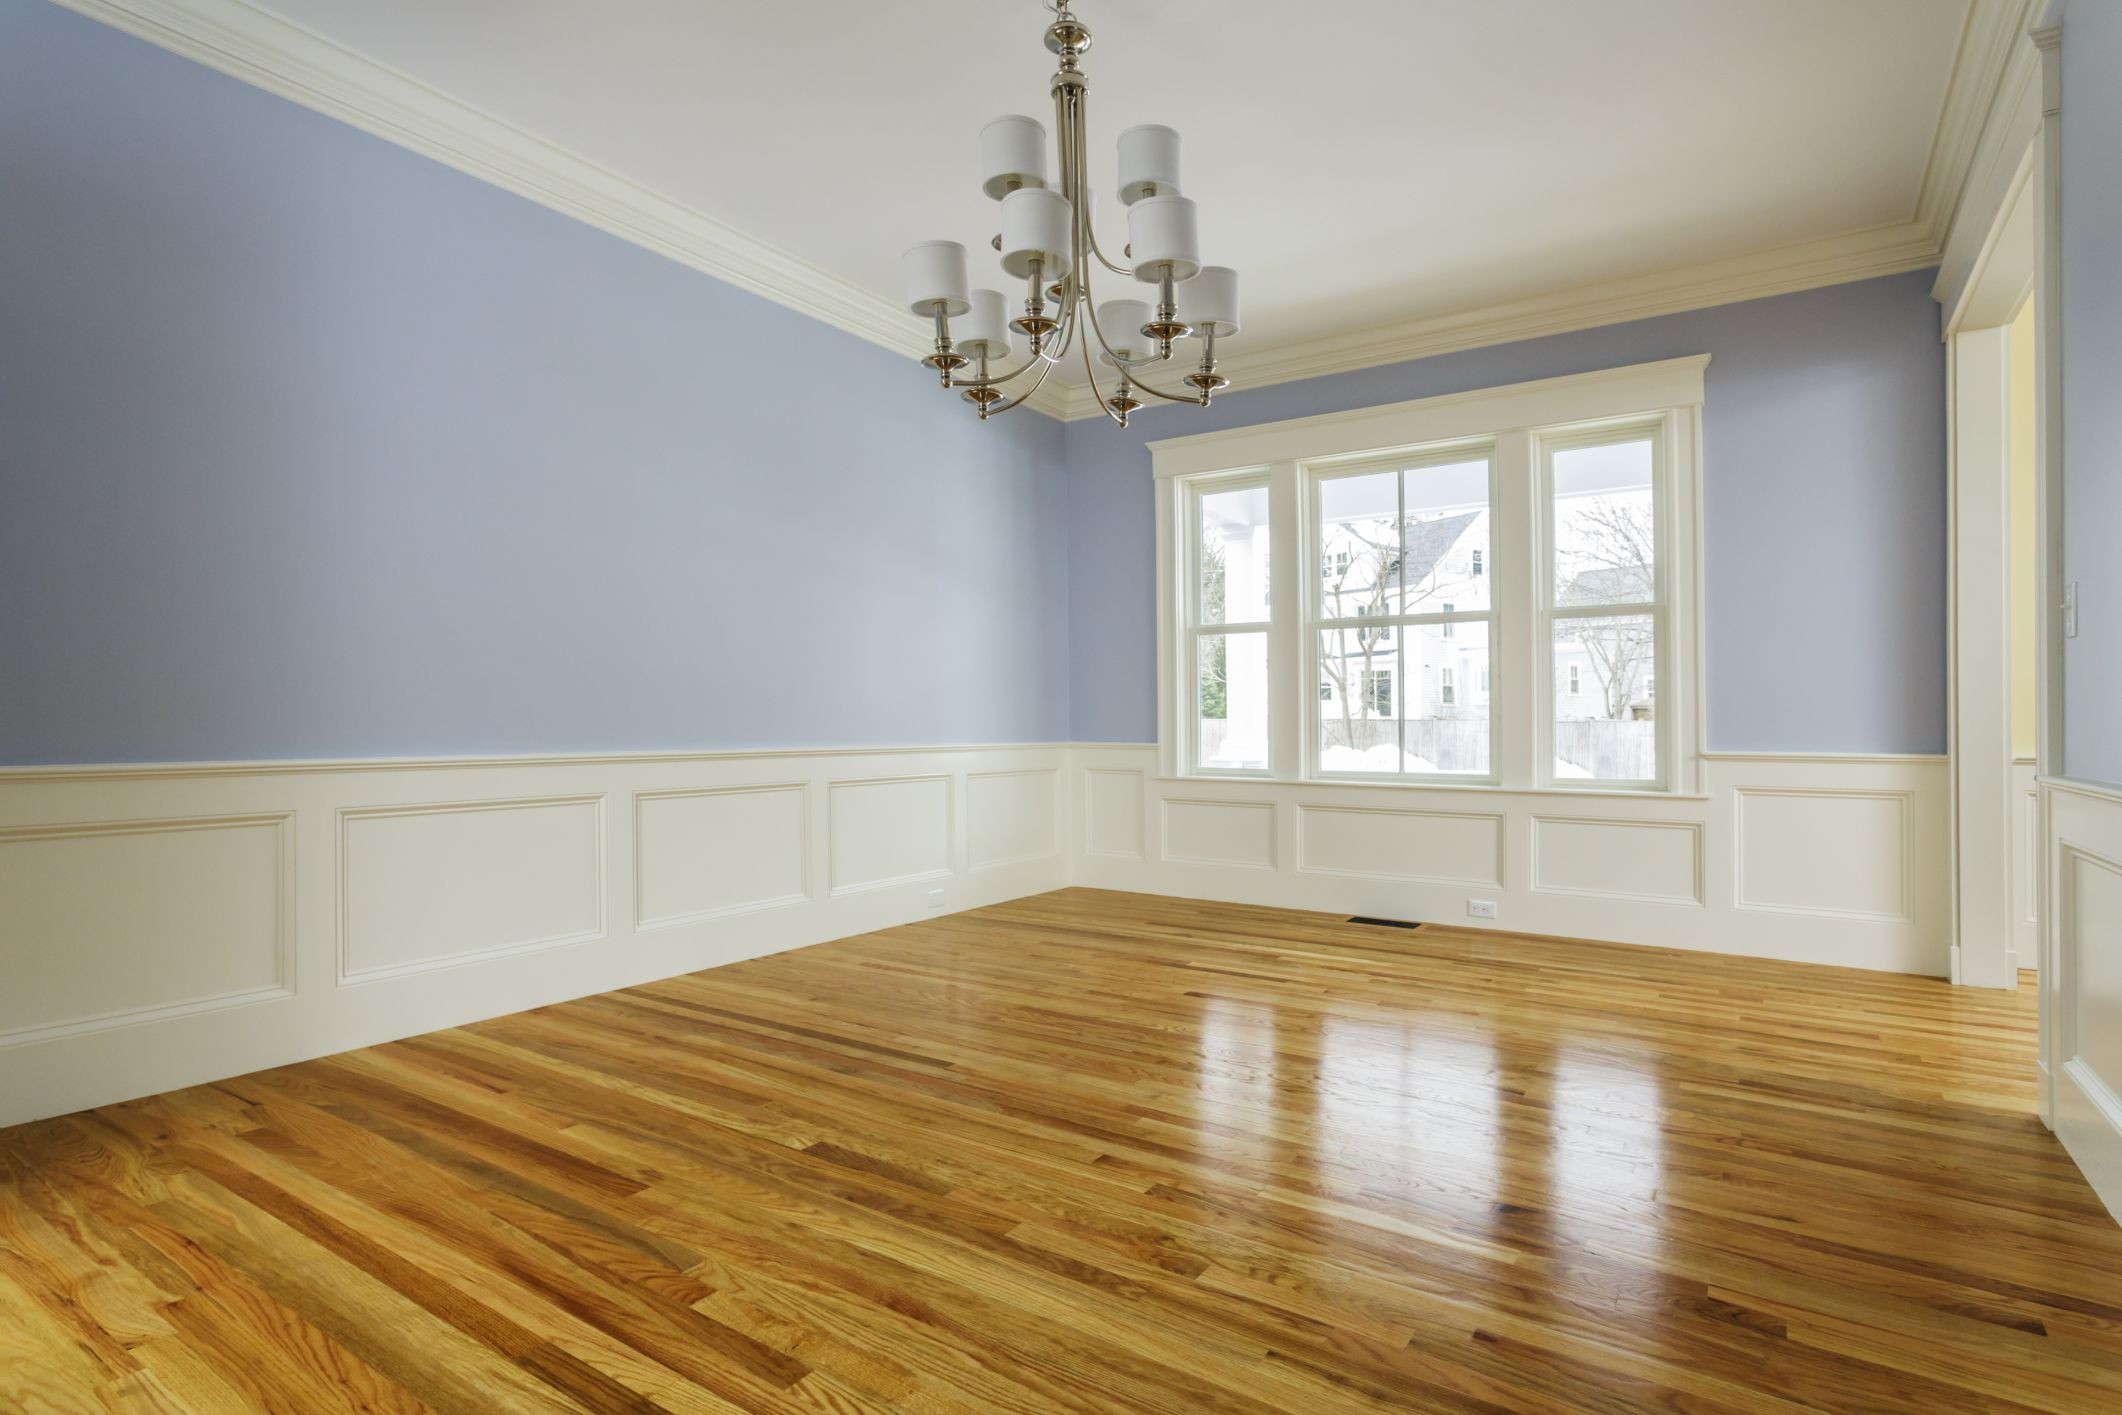 18 Fashionable Hardwood Floor Cost Per Square Meter 2021 free download hardwood floor cost per square meter of the cost to refinish hardwood floors regarding 168686572 highres 56a2fd773df78cf7727b6cb3